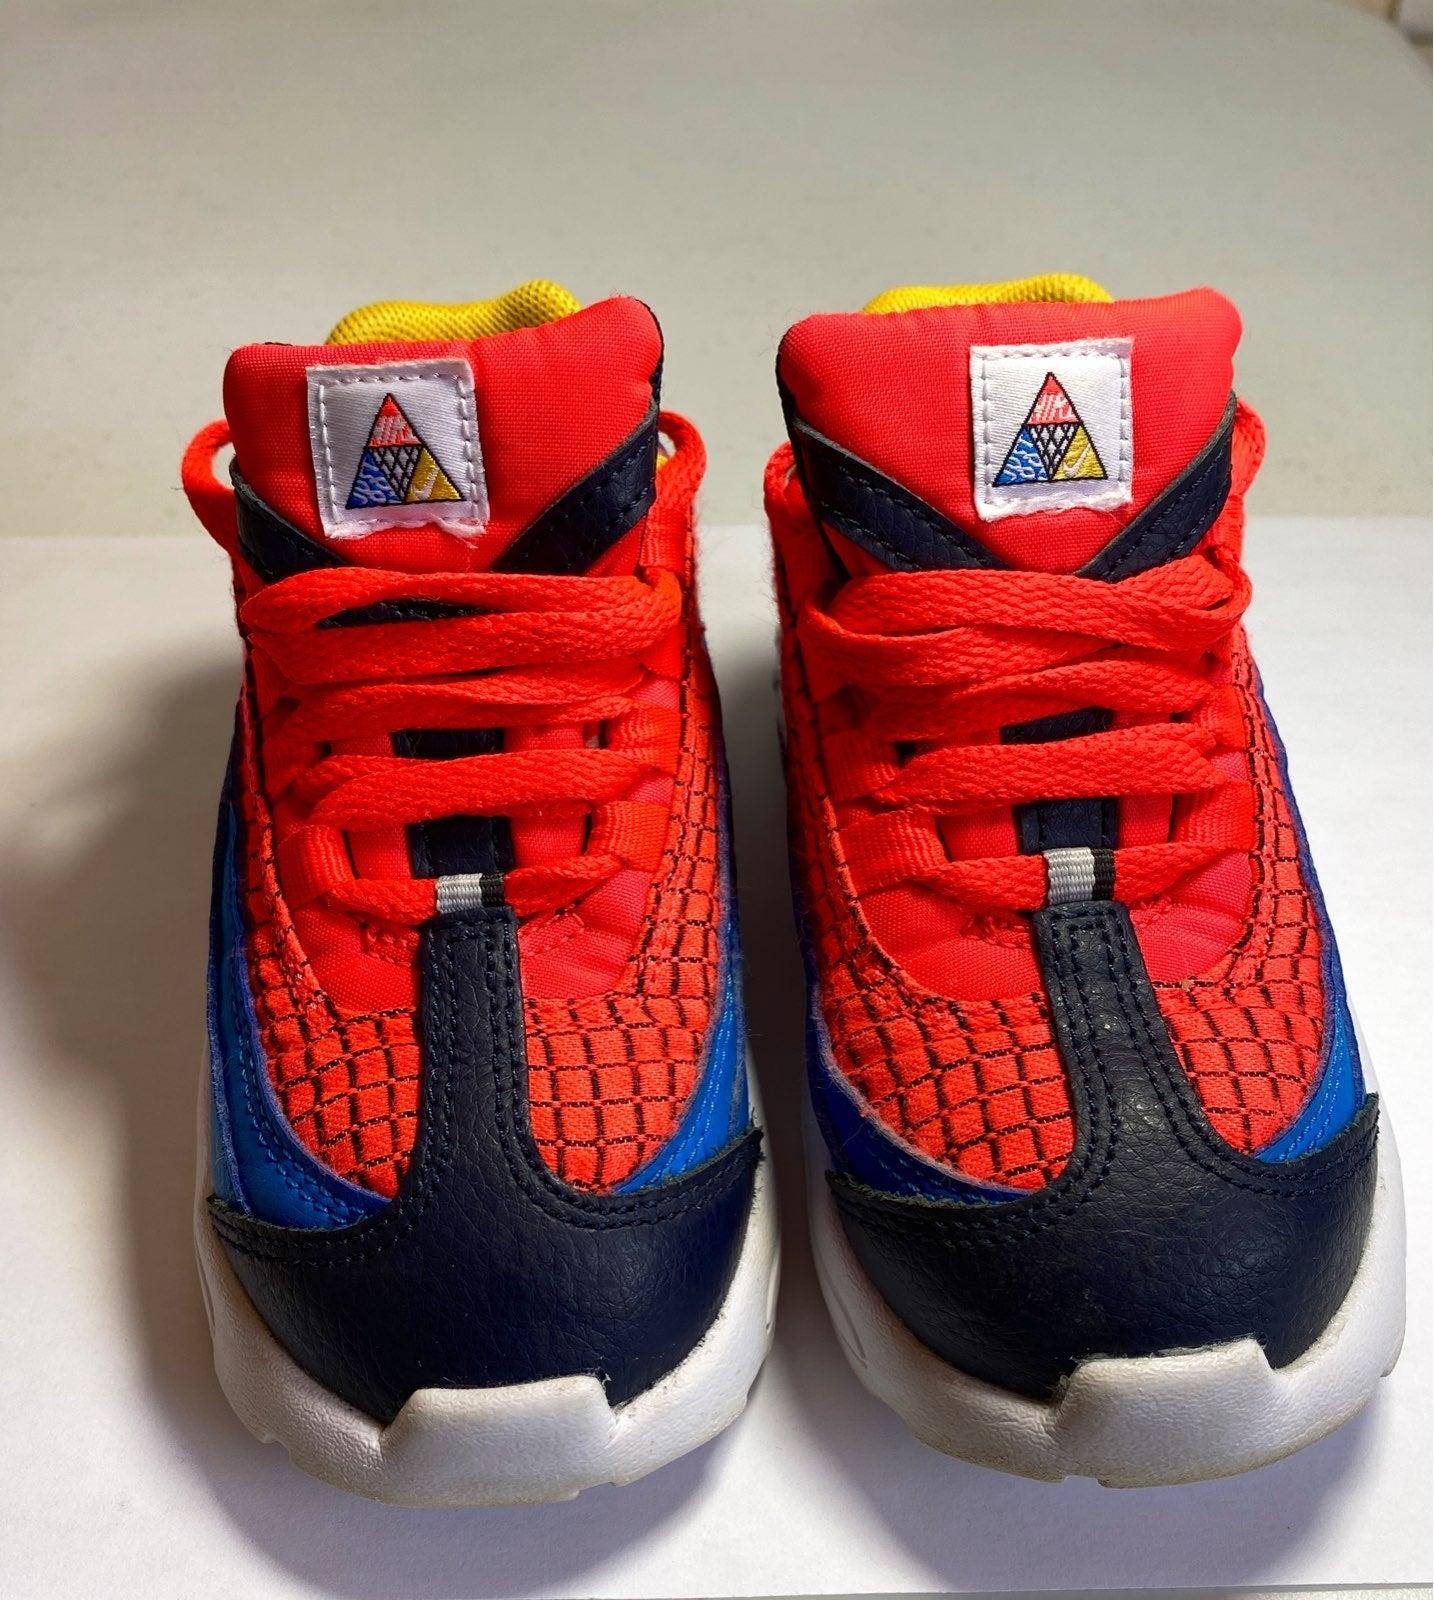 Nike Air Max 95 Shoes 8C Spiderman